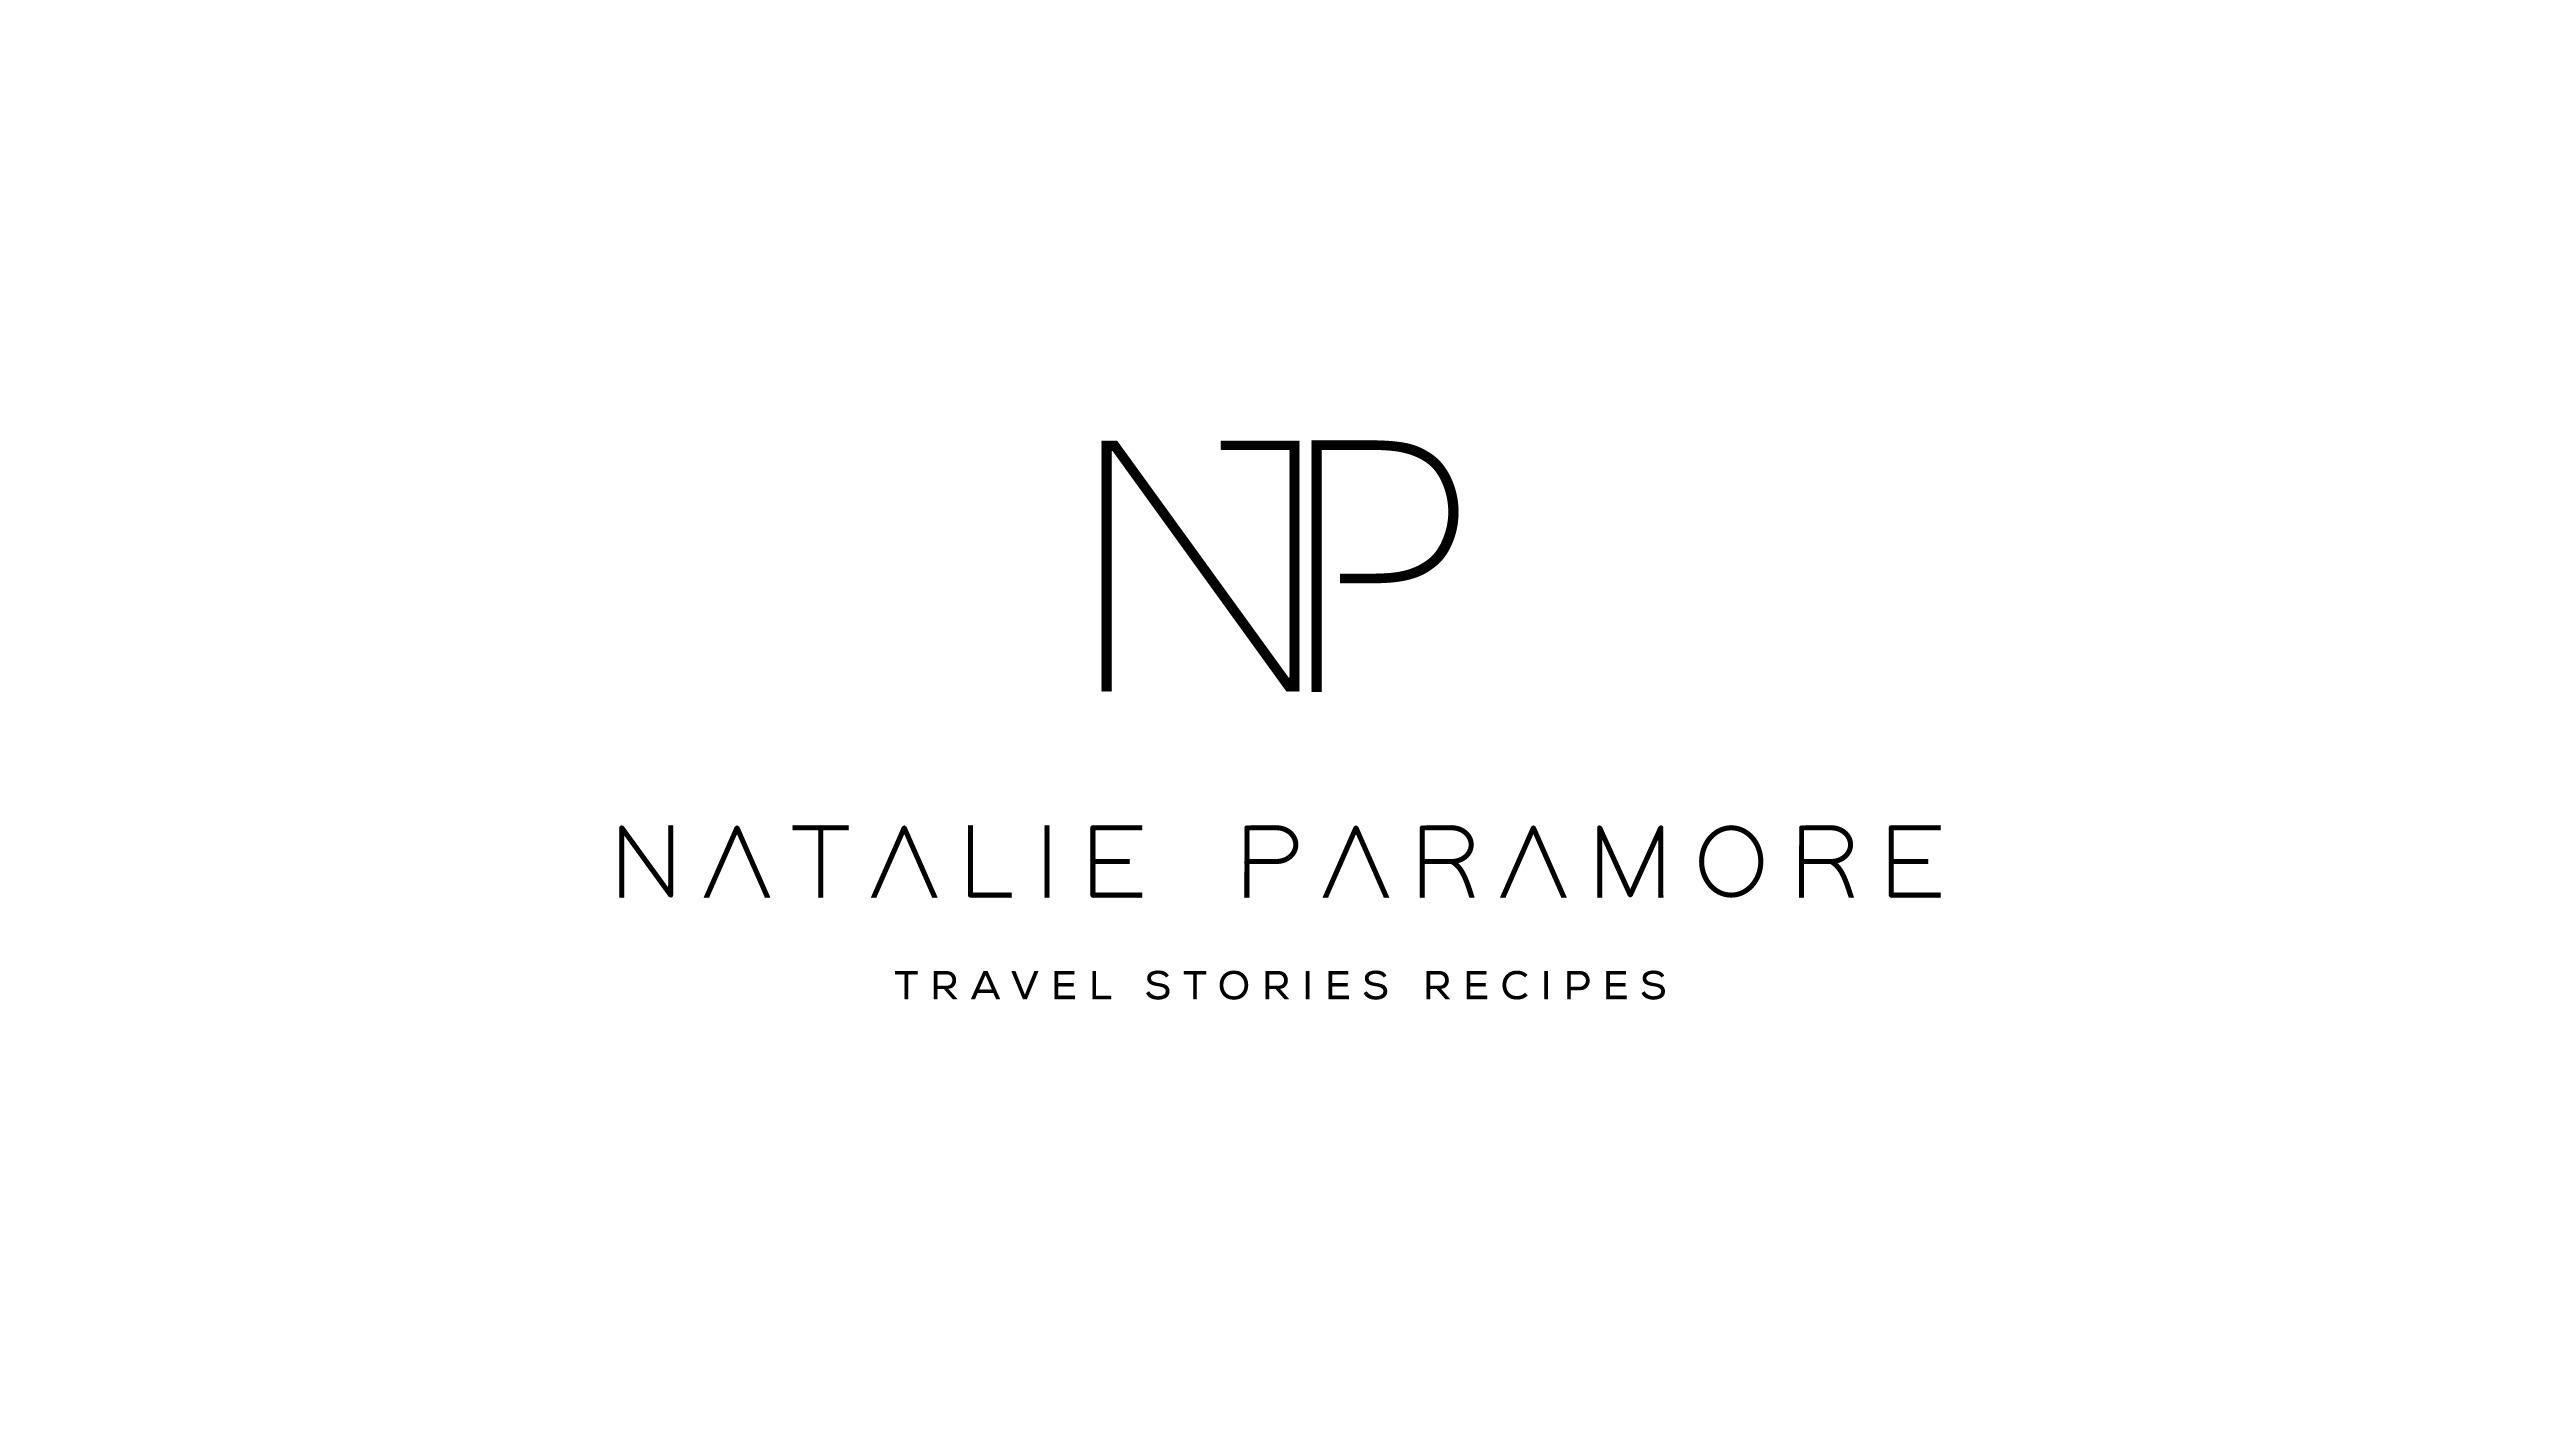 Natalie Paramore